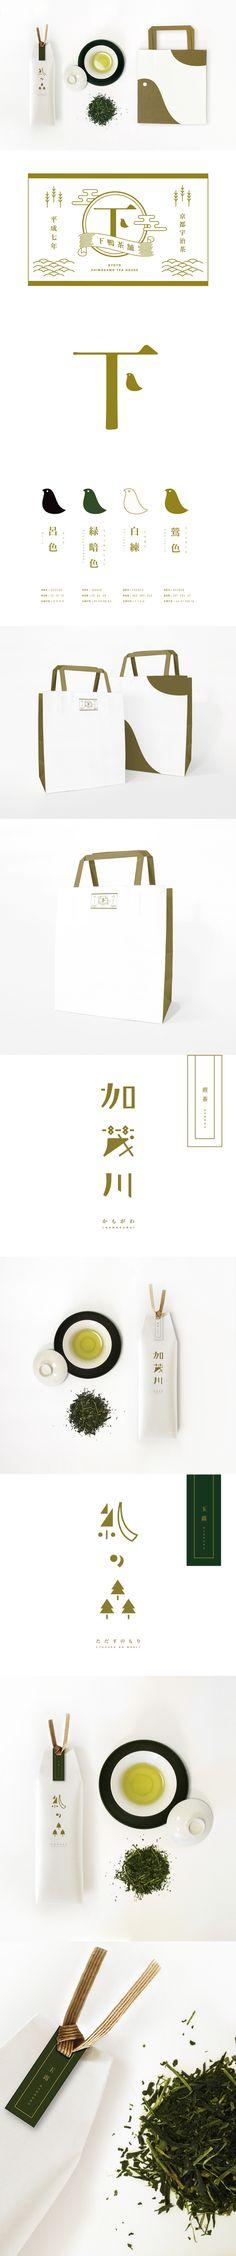 SHIMOGAMO TEA HOUSE Branding Design by Nana Nozaki http://nananozaki.com/2015/shimogamo-tea-house.html